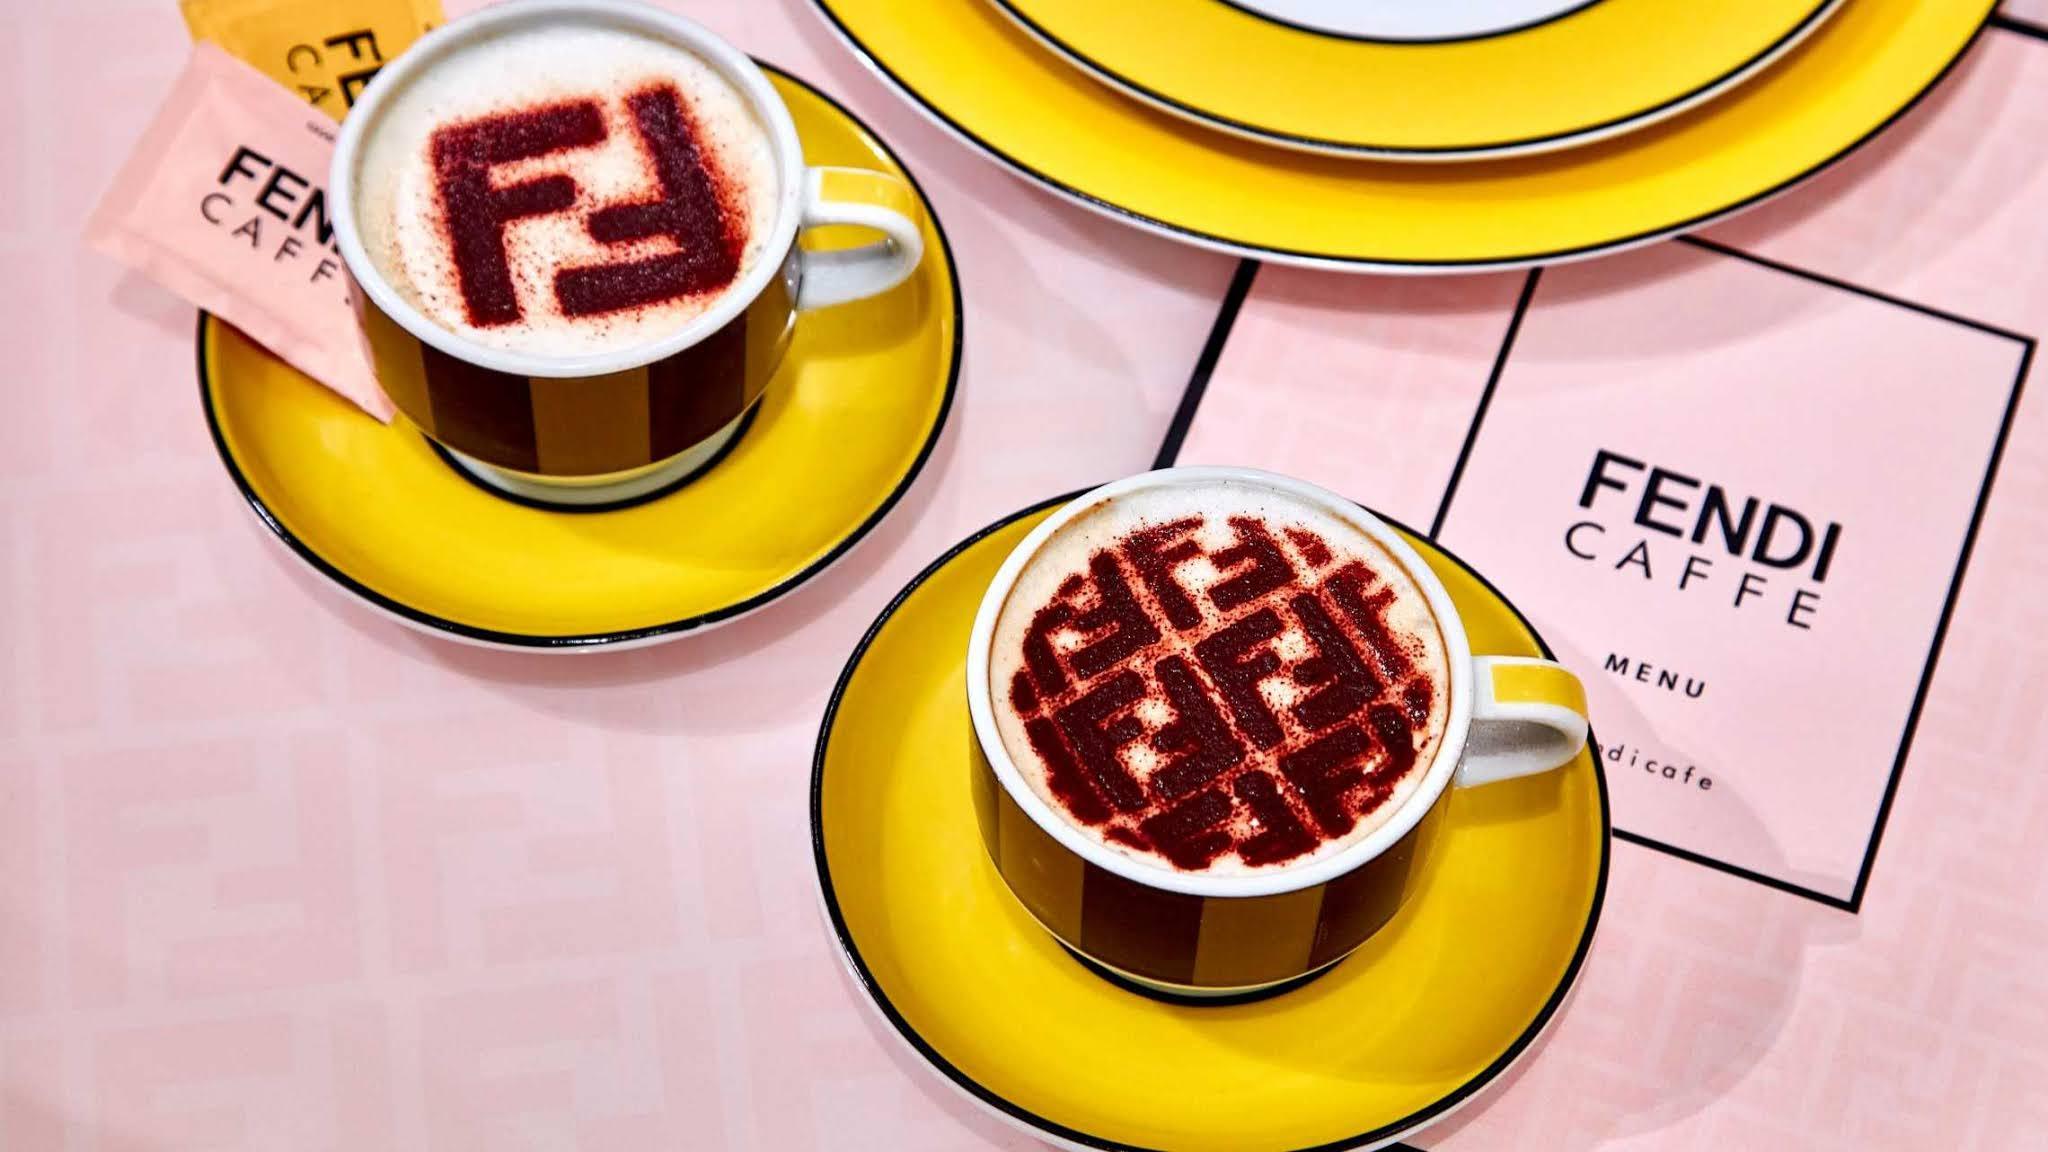 FENDI CAFFE SELFRIDGES LONDON